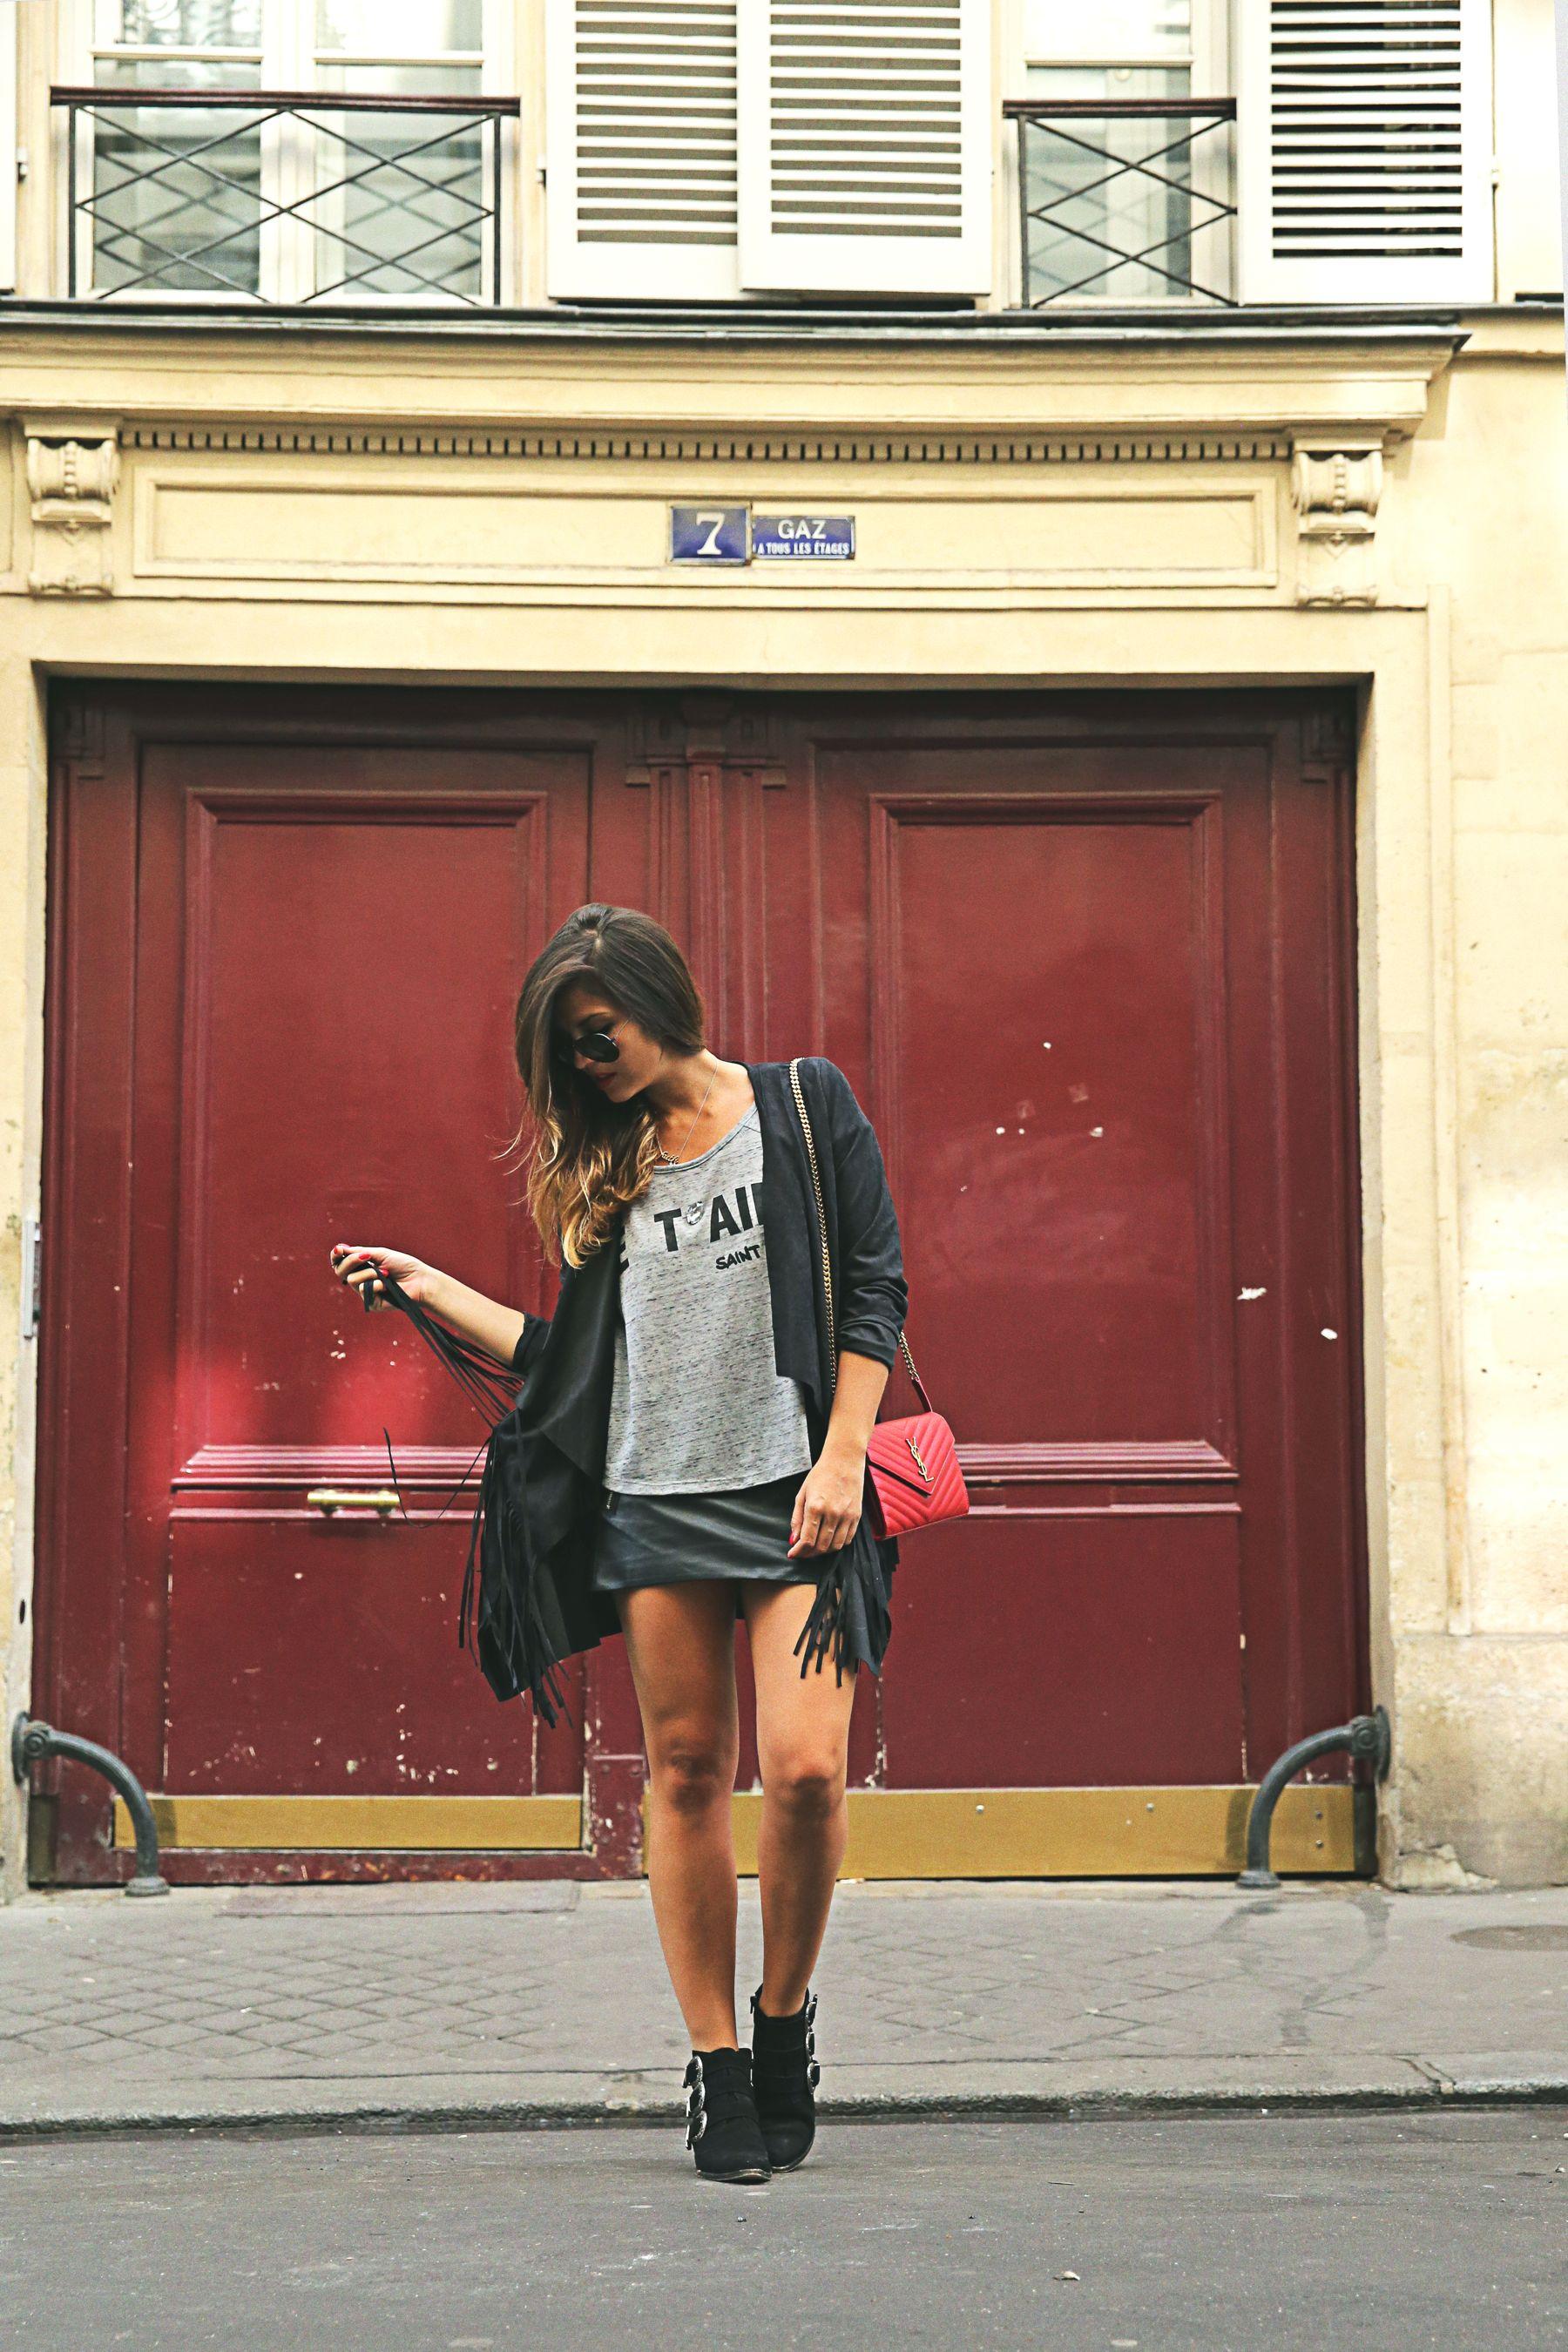 trendy-taste-look-outfit-street-style-ootd-blog-blogger-fashion-spain-moda-españa-fringed-jacket-mustt-ysl-falda-mekdes-leather-piel-9